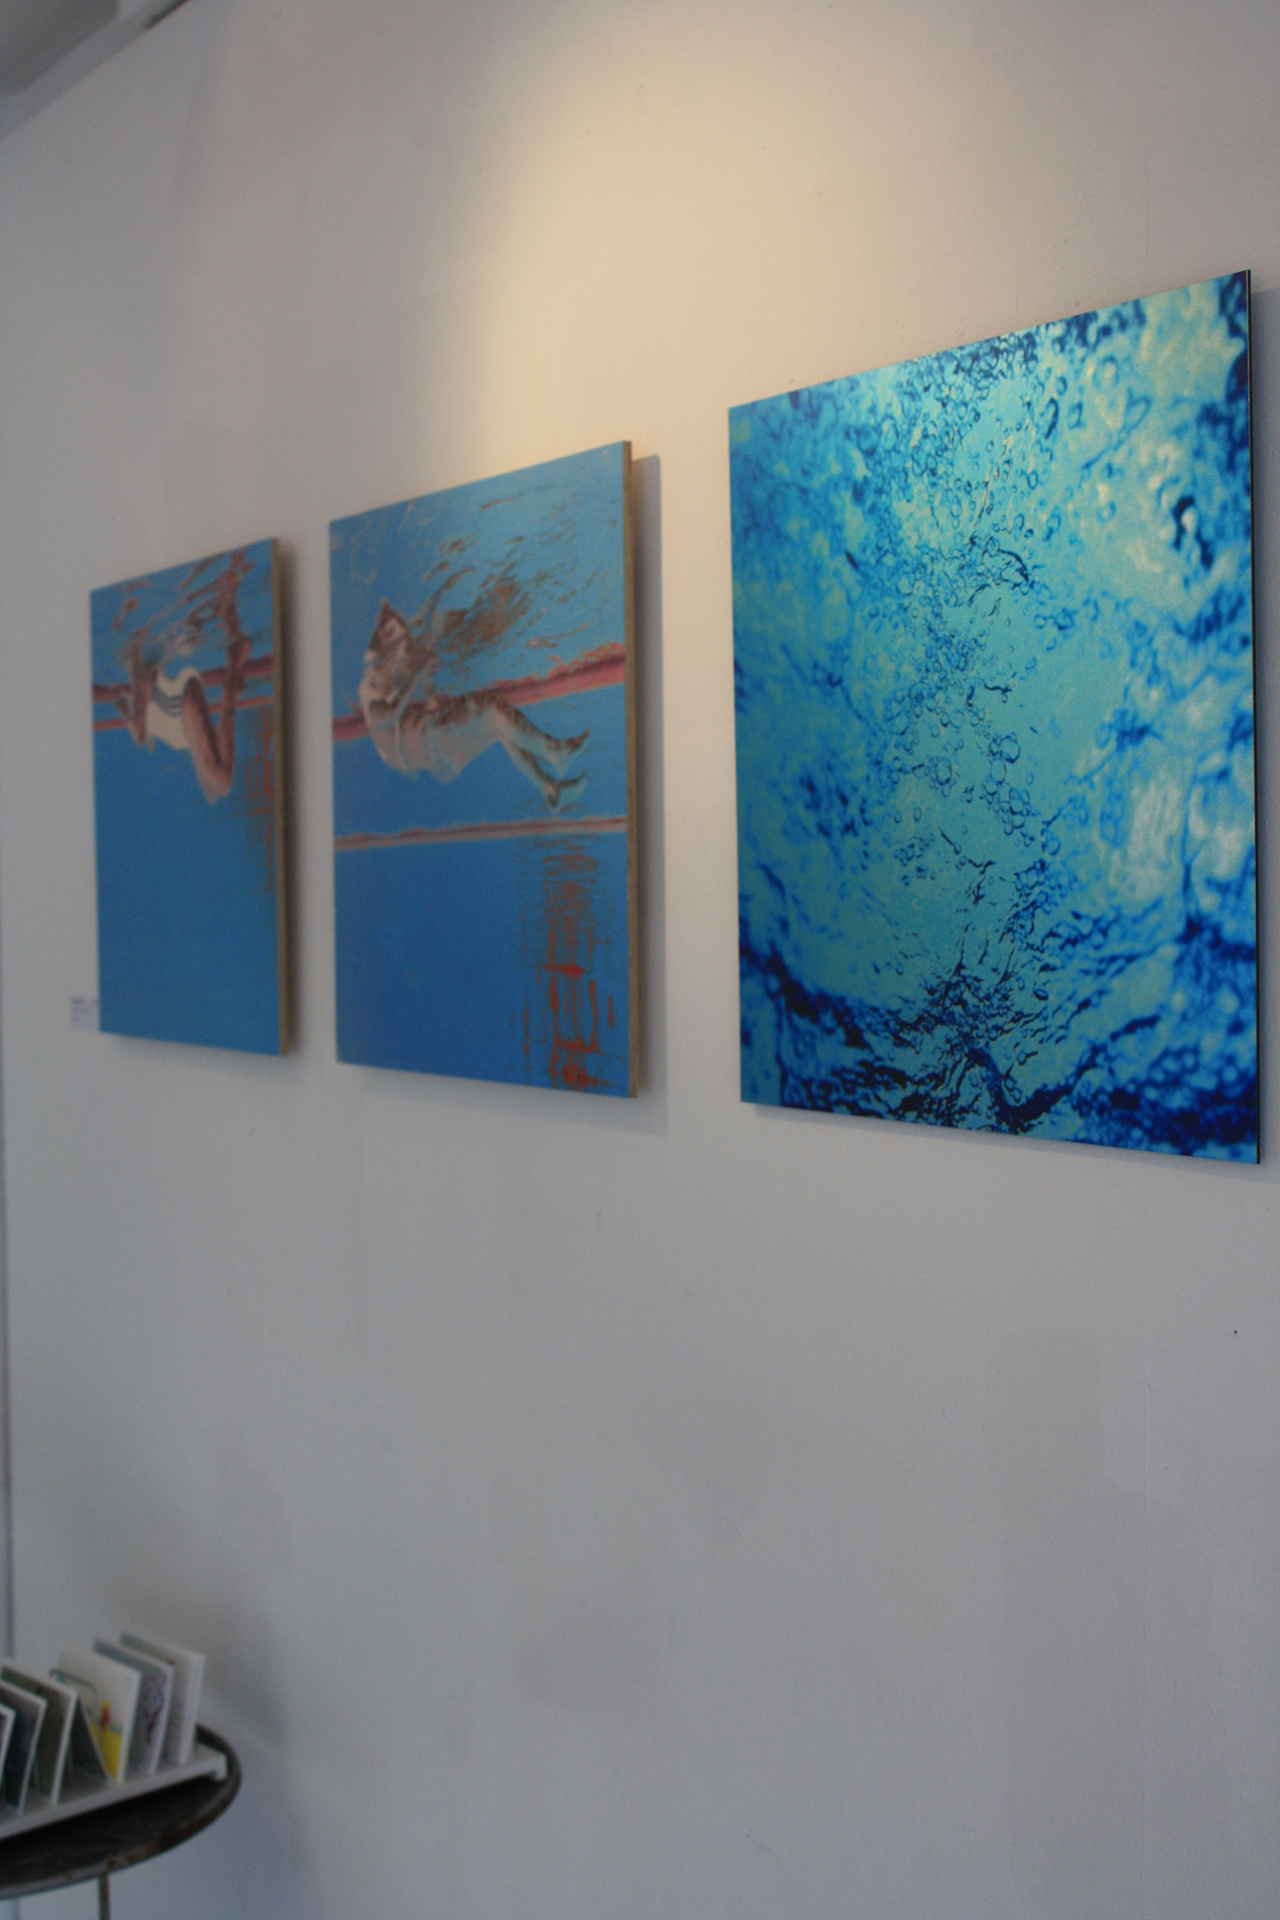 Feierwerk_Blog_Farbenladen_Kanikuly_Galerie_4